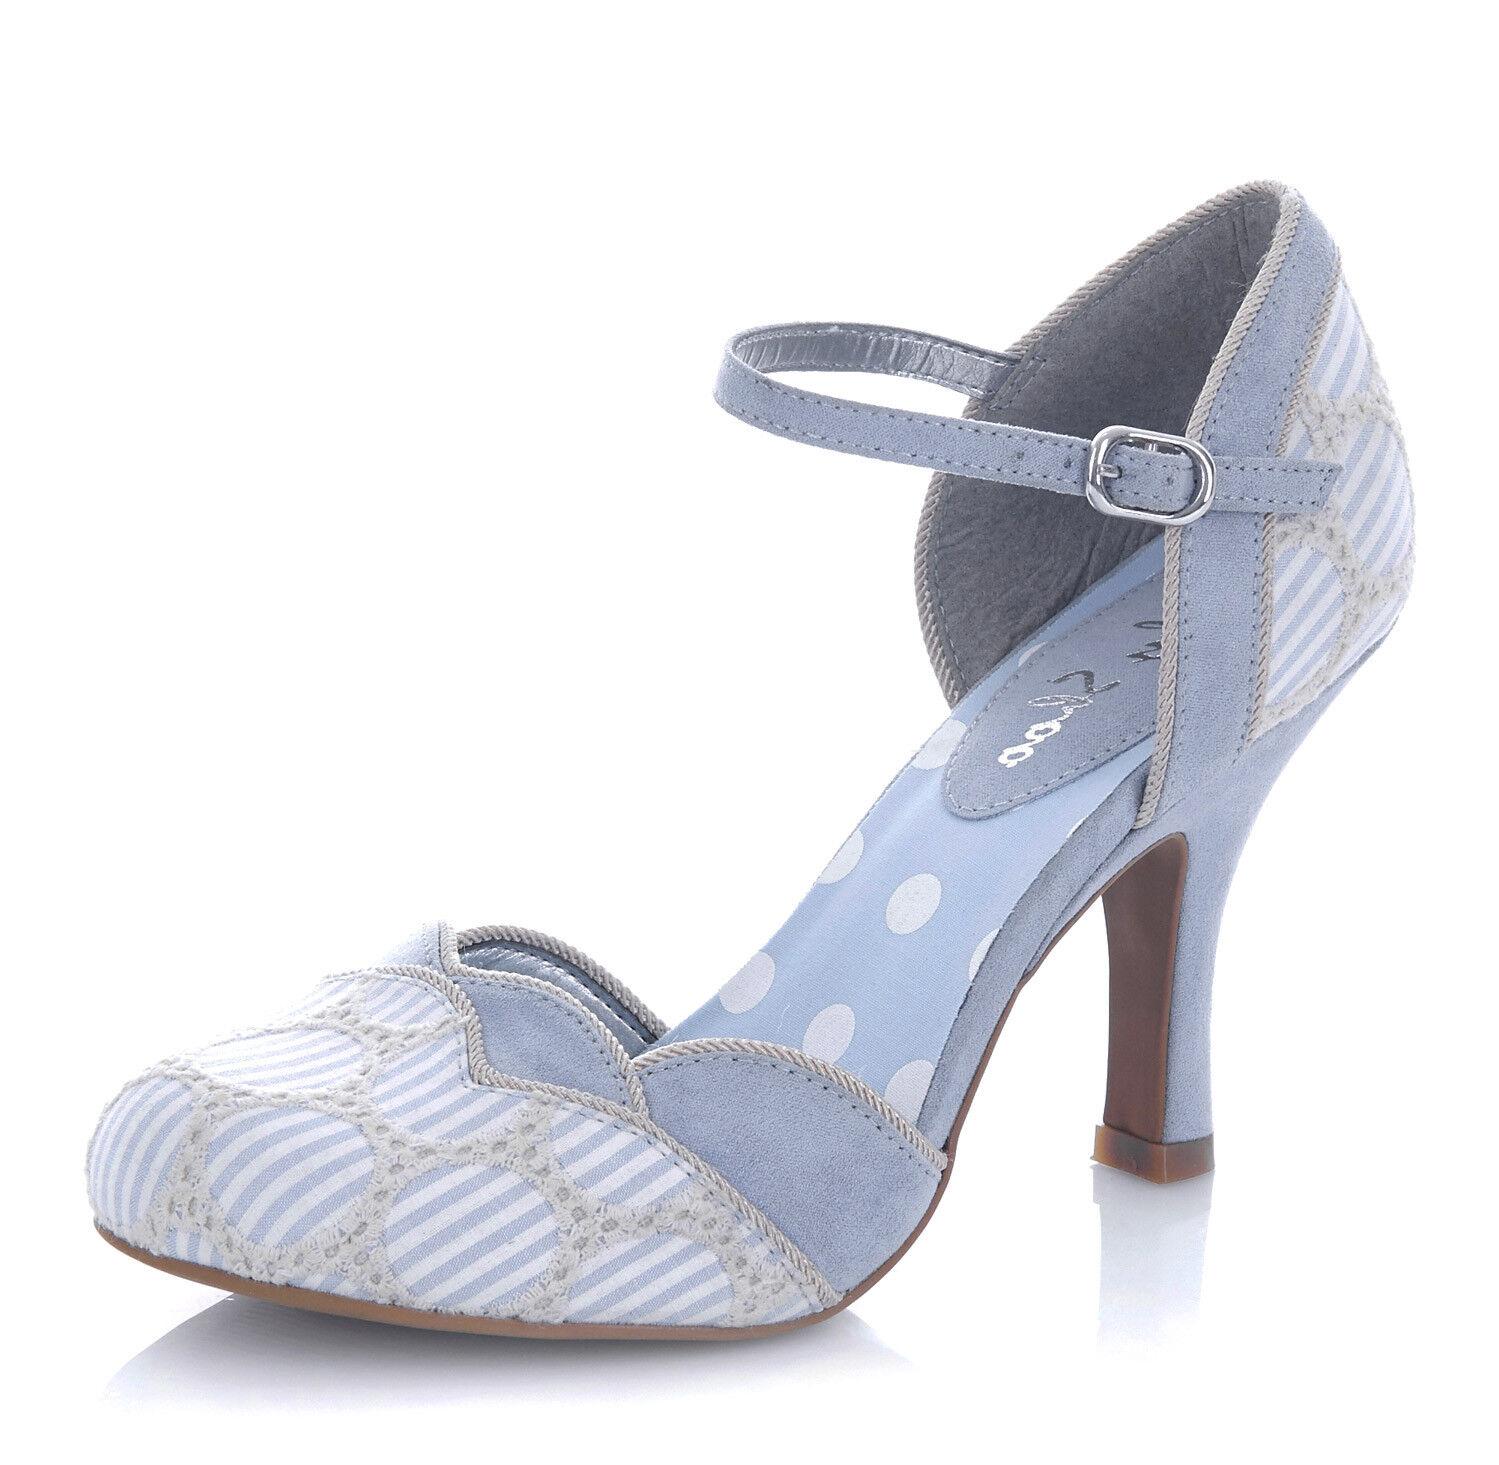 Ruby Shoo NEW Phoebe sky blue cream stripe high 3-9 heel sandals shoes size 3-9 high 062b62